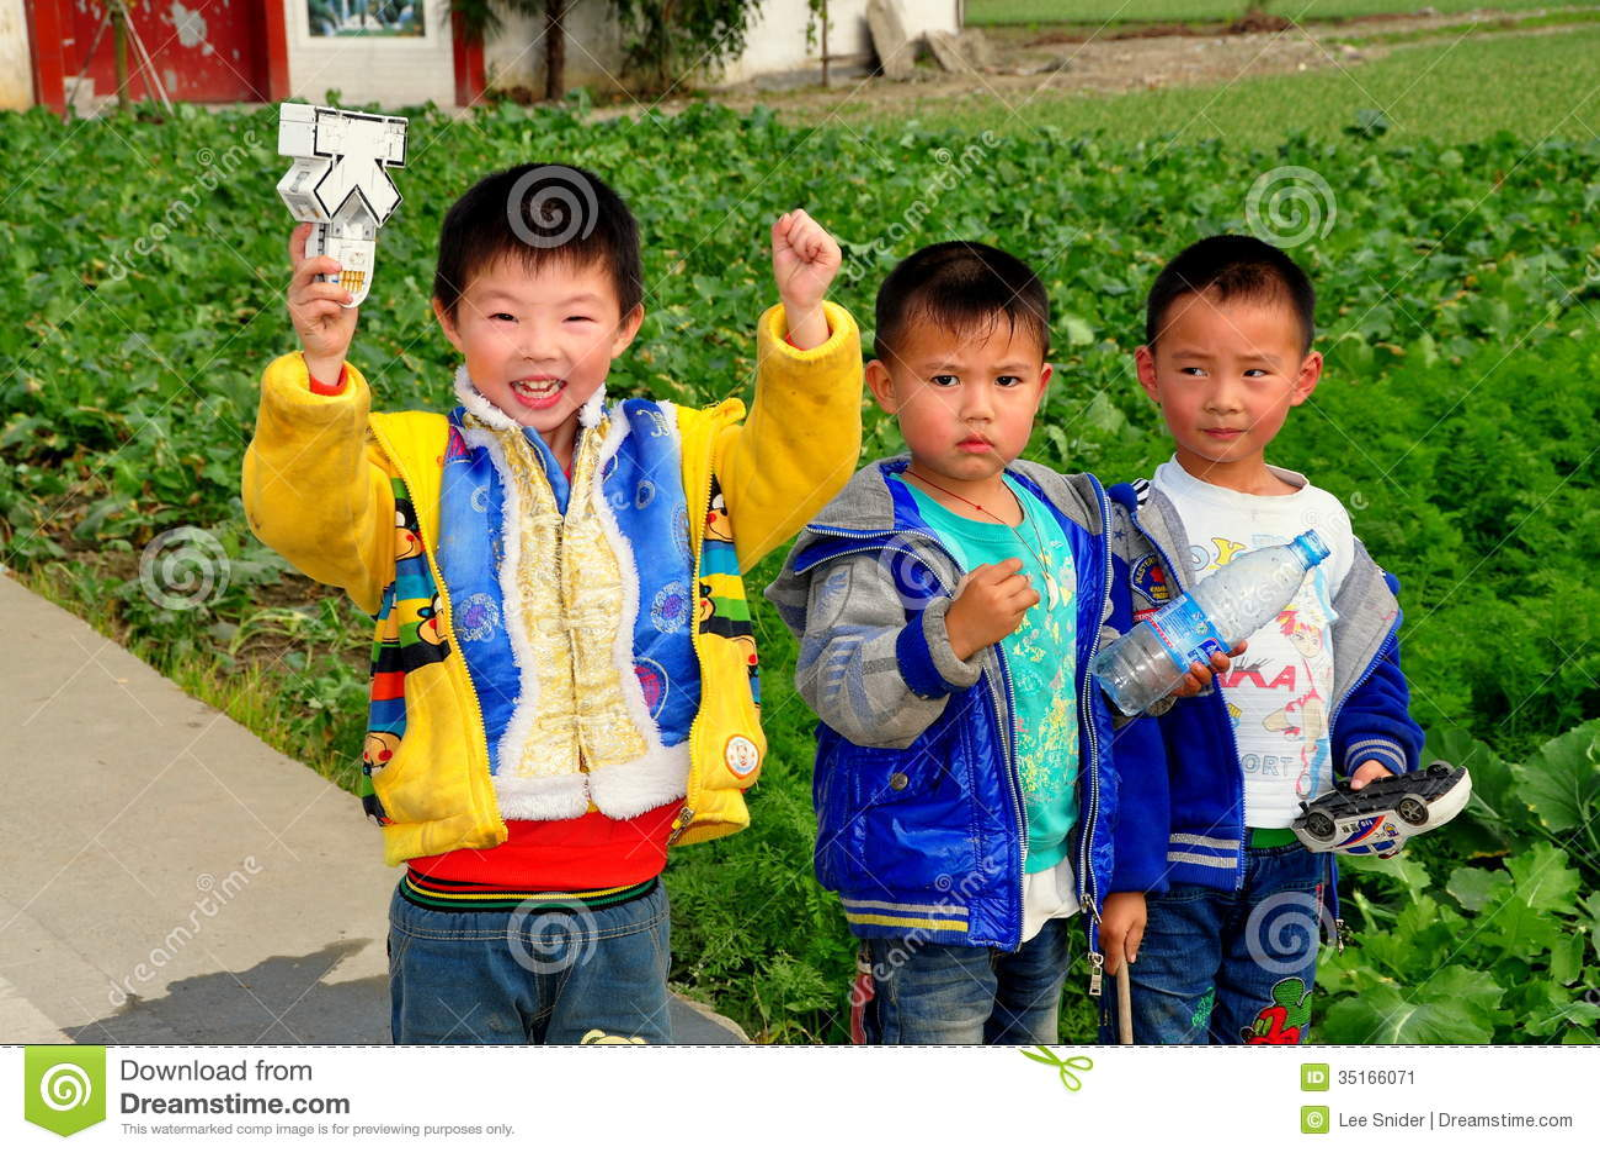 Pengzhou China Three Little Boys On Farm Editorial Photo Image  # Bois En Chaene